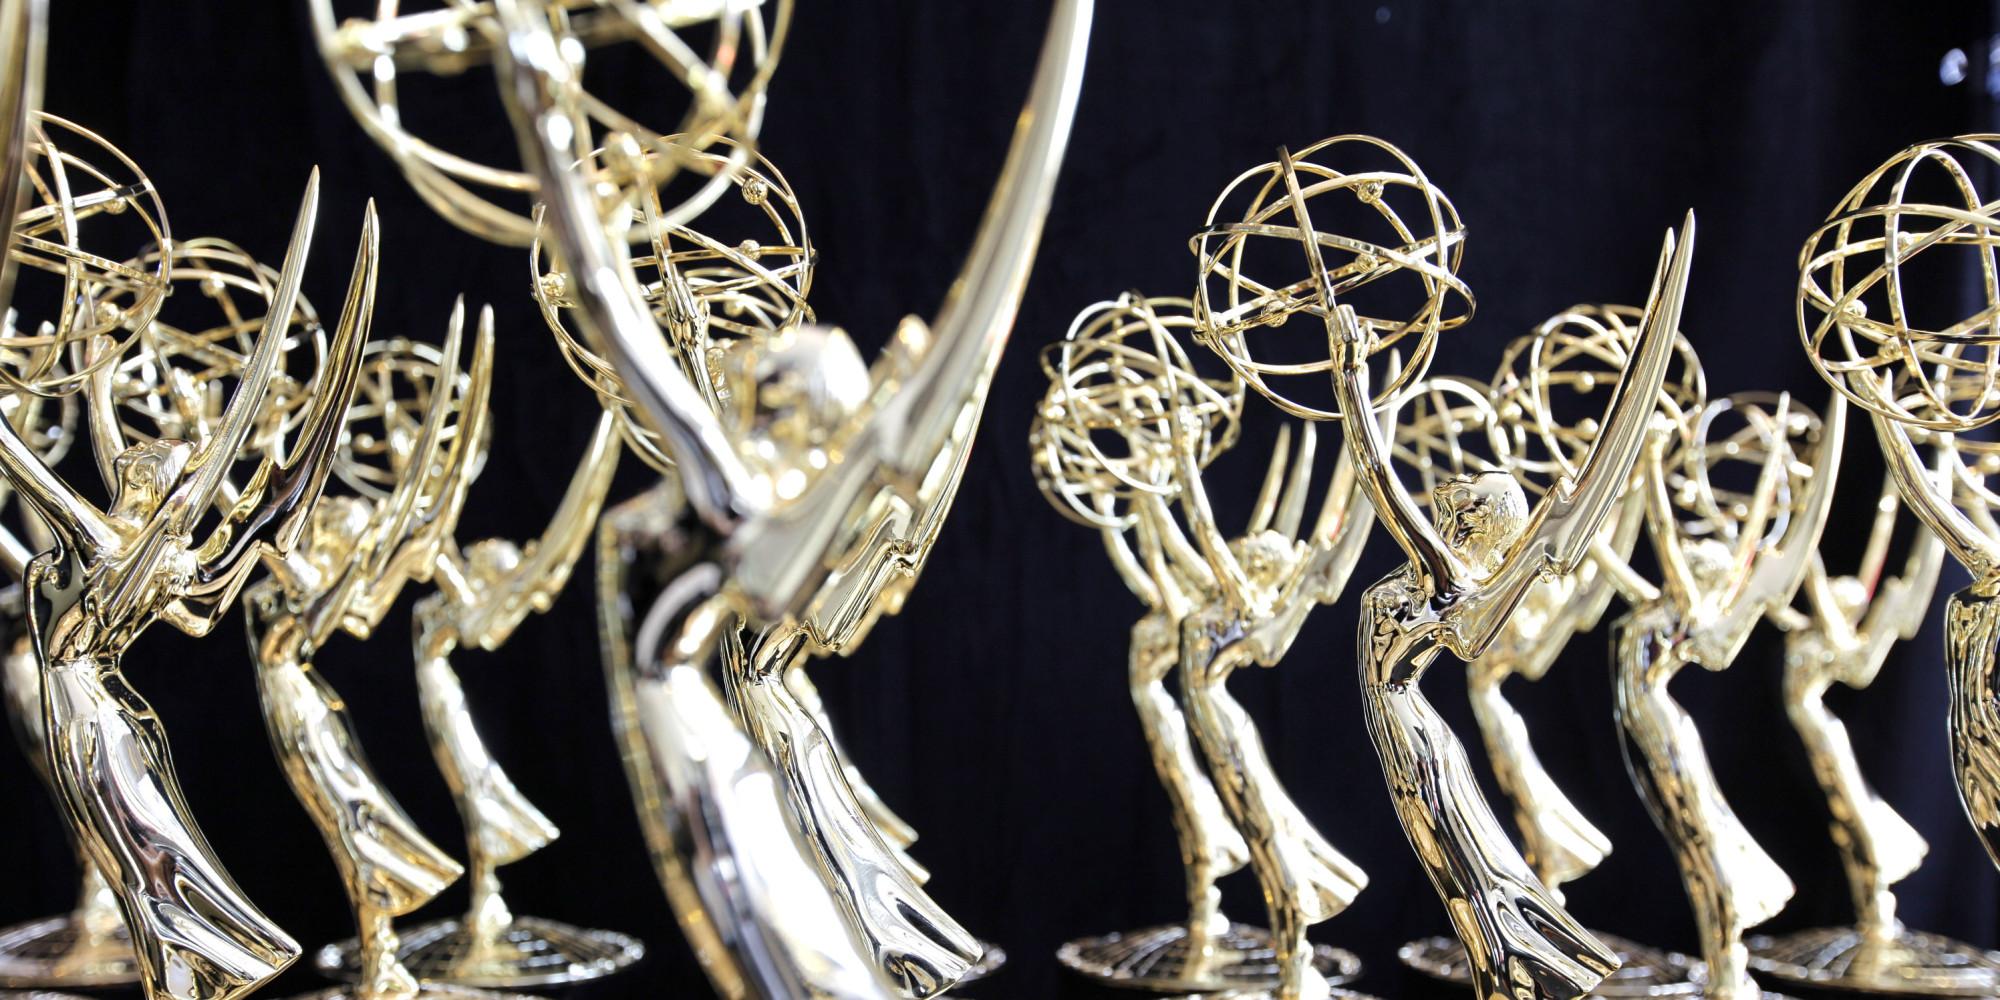 62nd Primetime Emmy Awards - Audience